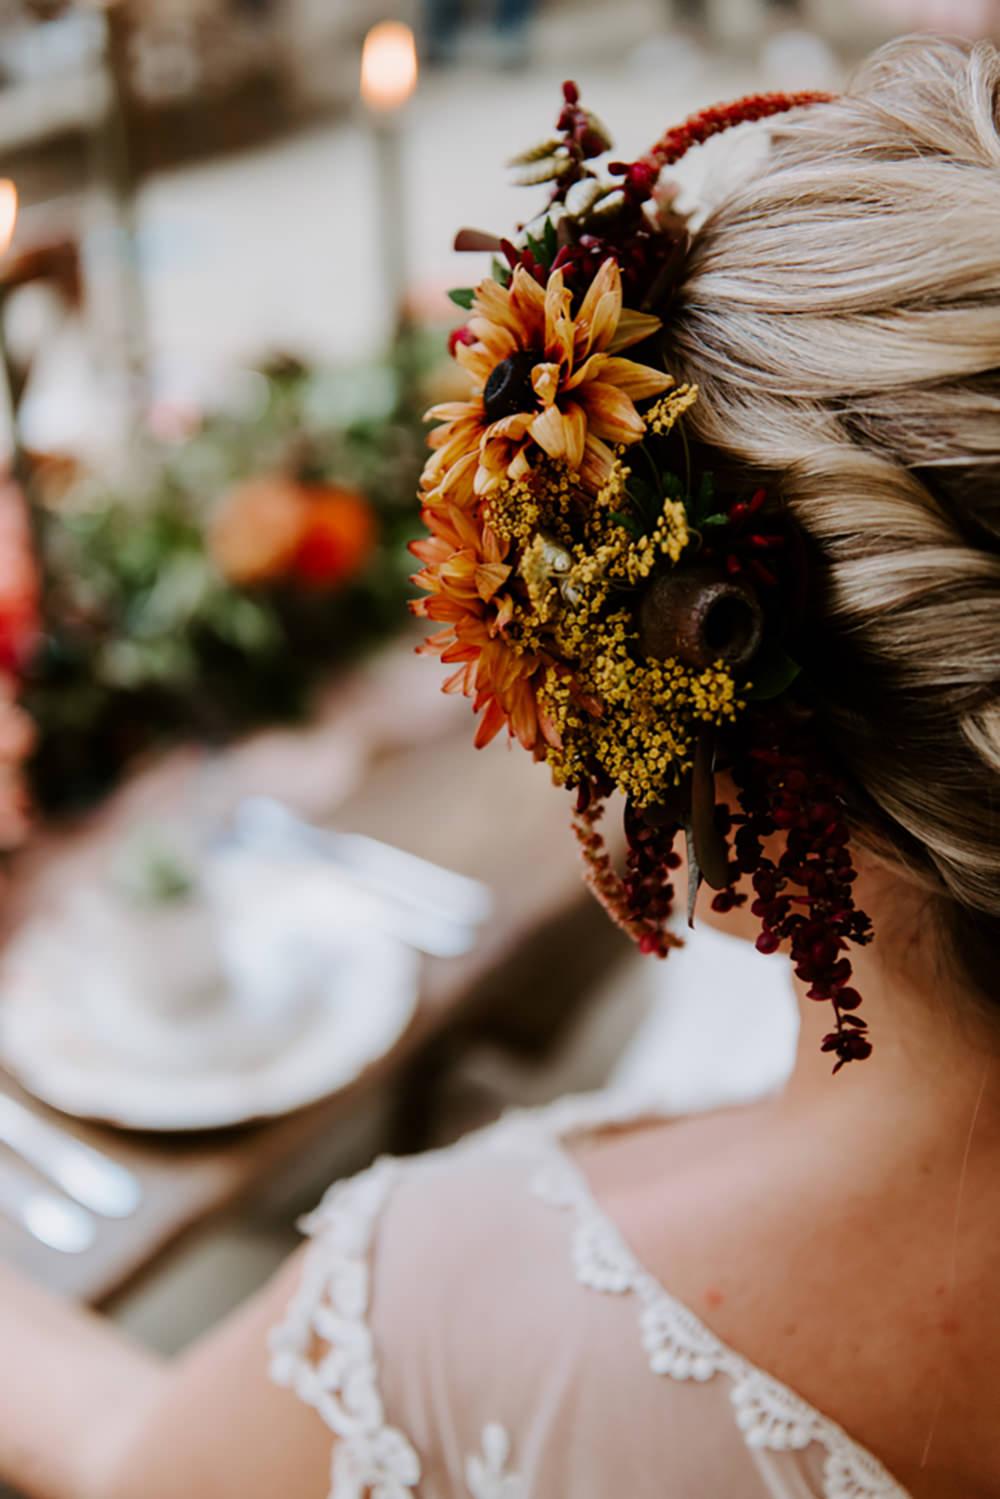 Bride Bridal Hair Flower Crown Halo Headdress Accessory Ethical Wedding Ideas Sadie Osborne Photography